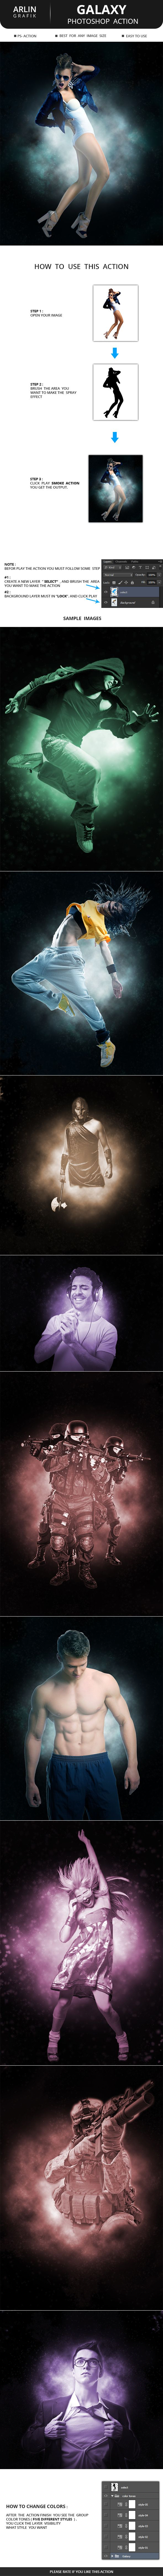 Galaxy Photoshop Action